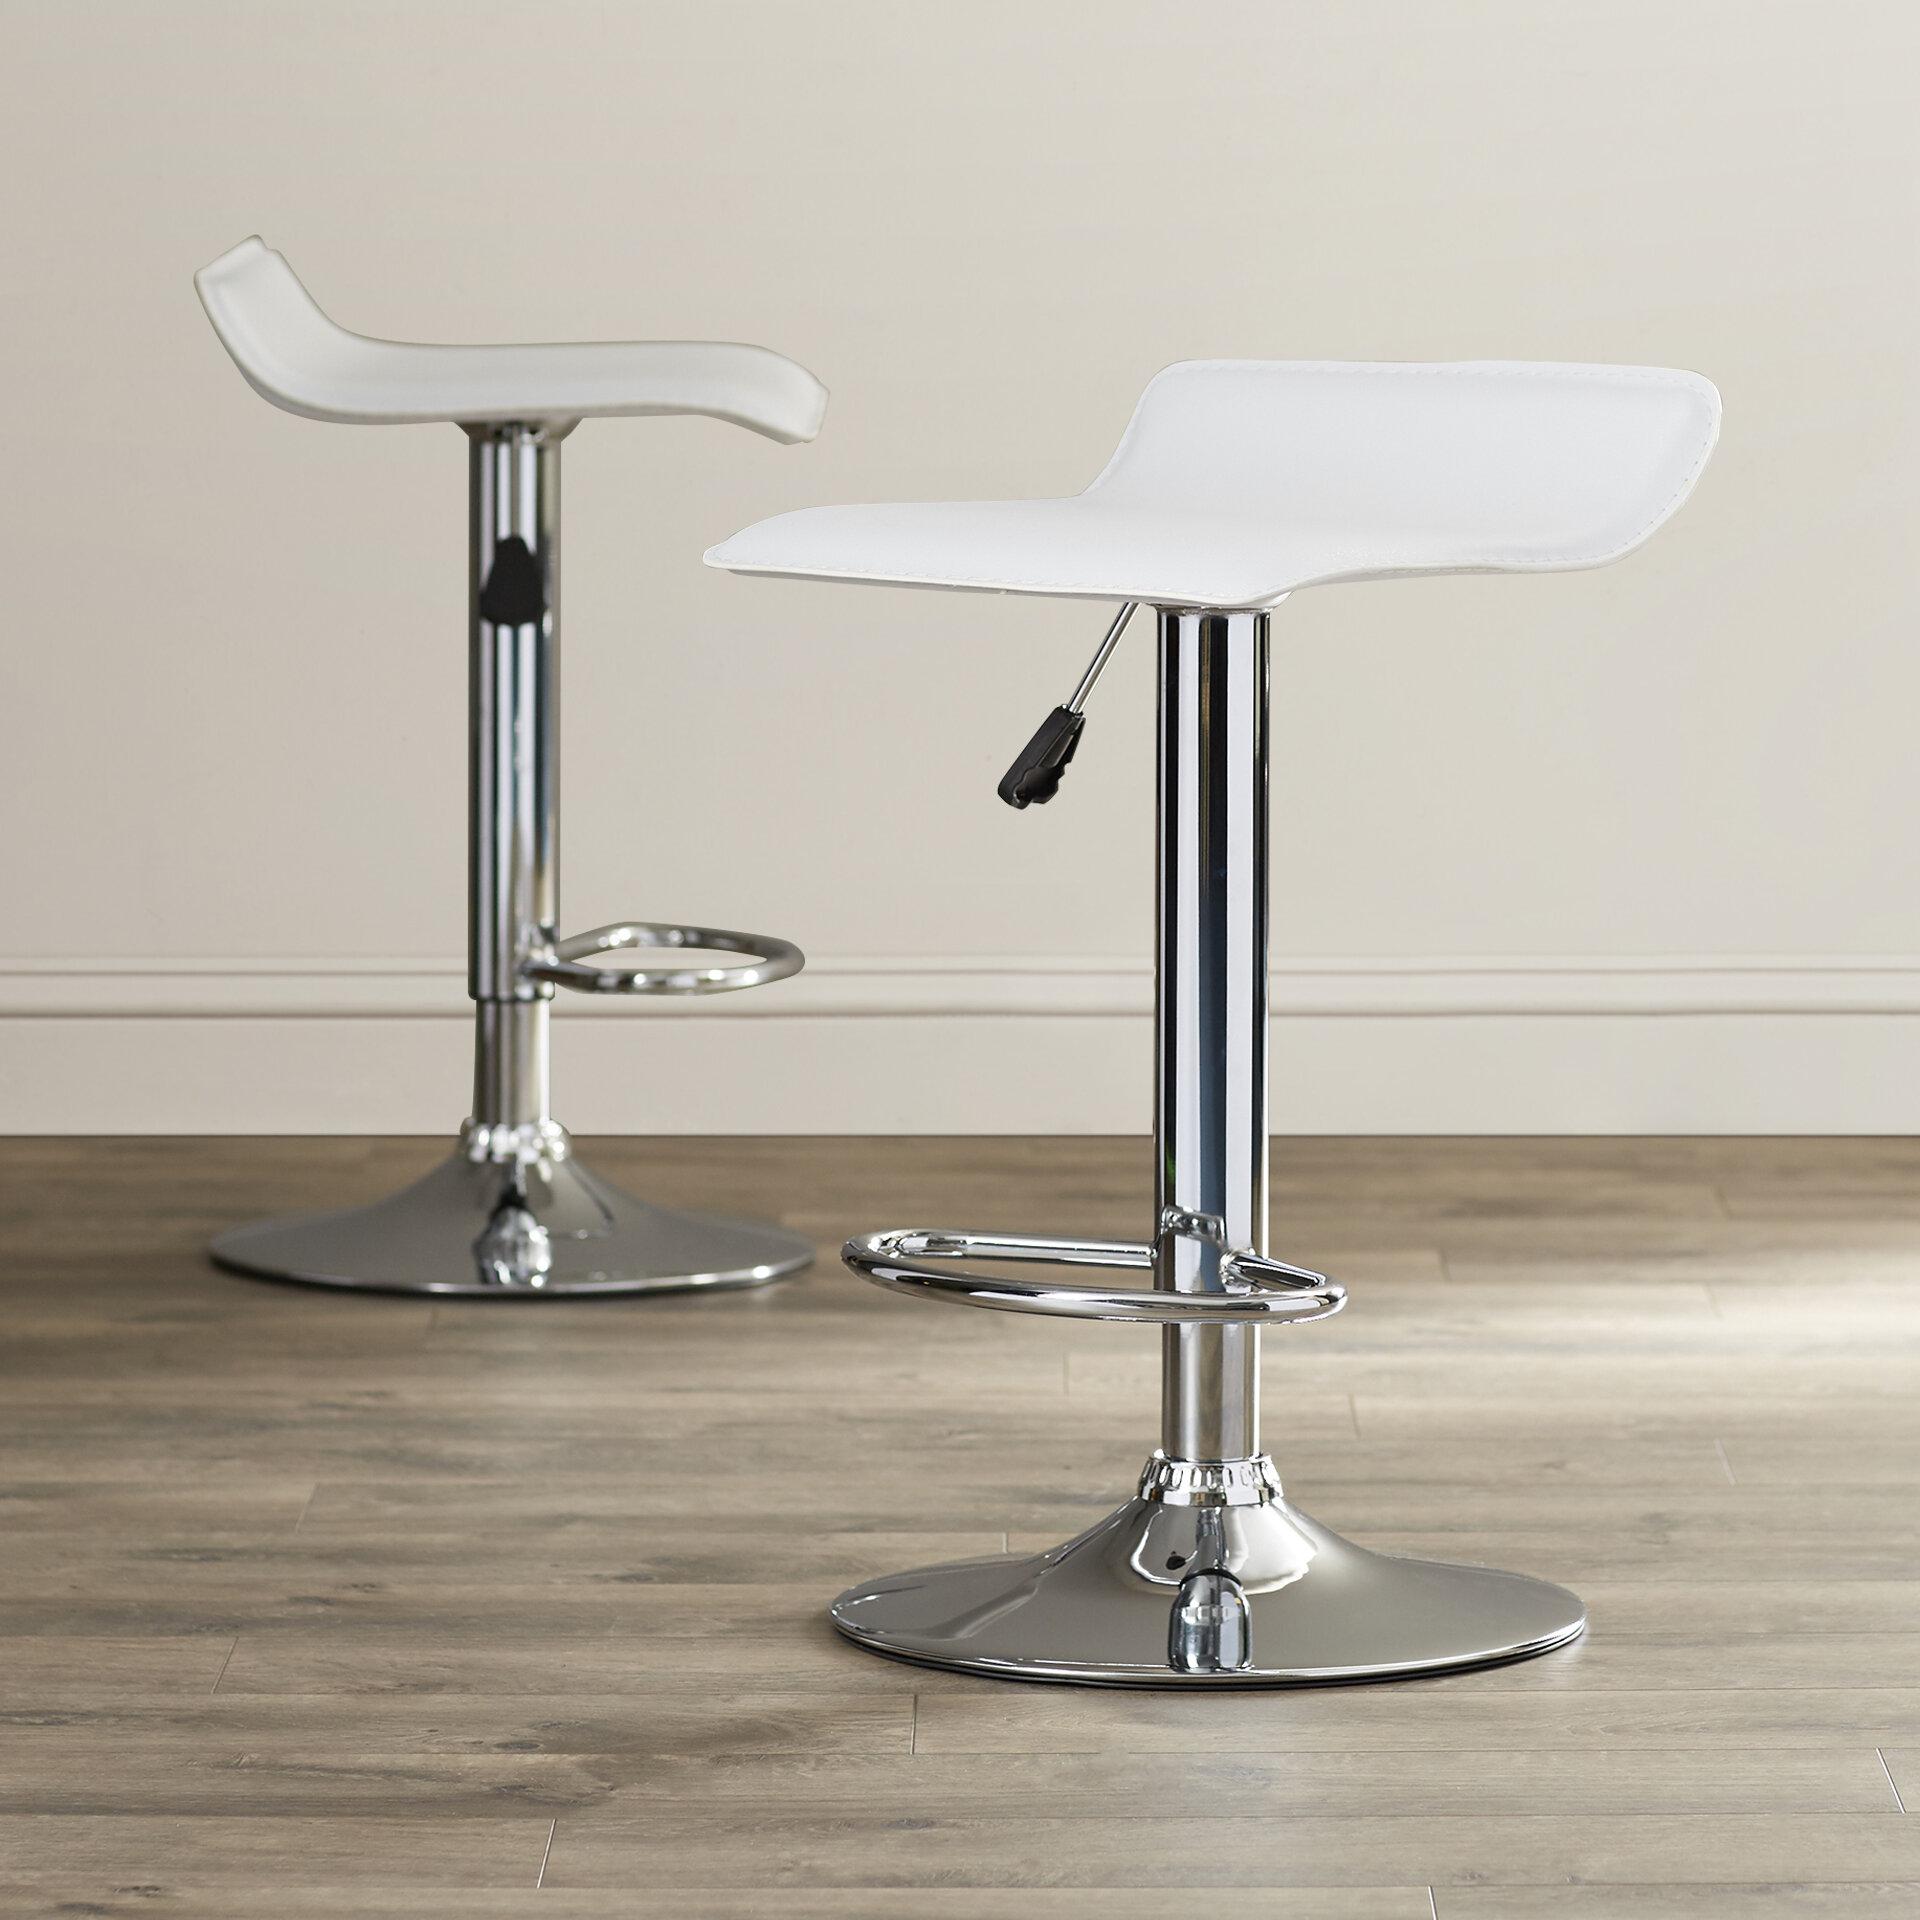 Superb Gould 33 Swivel Bar Stool Pabps2019 Chair Design Images Pabps2019Com